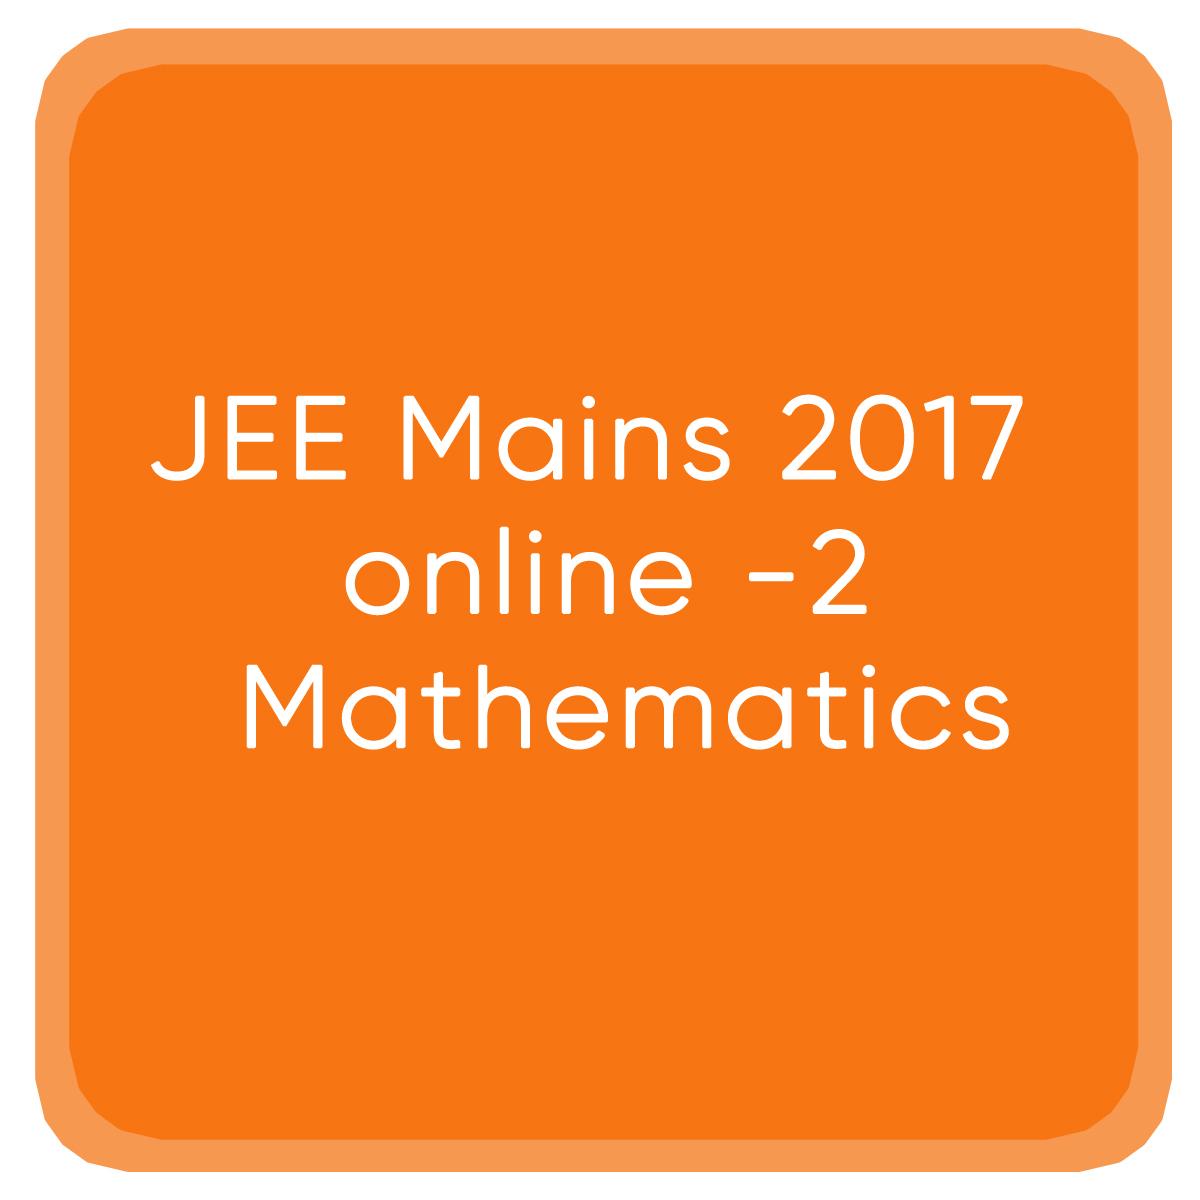 JEE Mains 2017 online -2 Mathematics